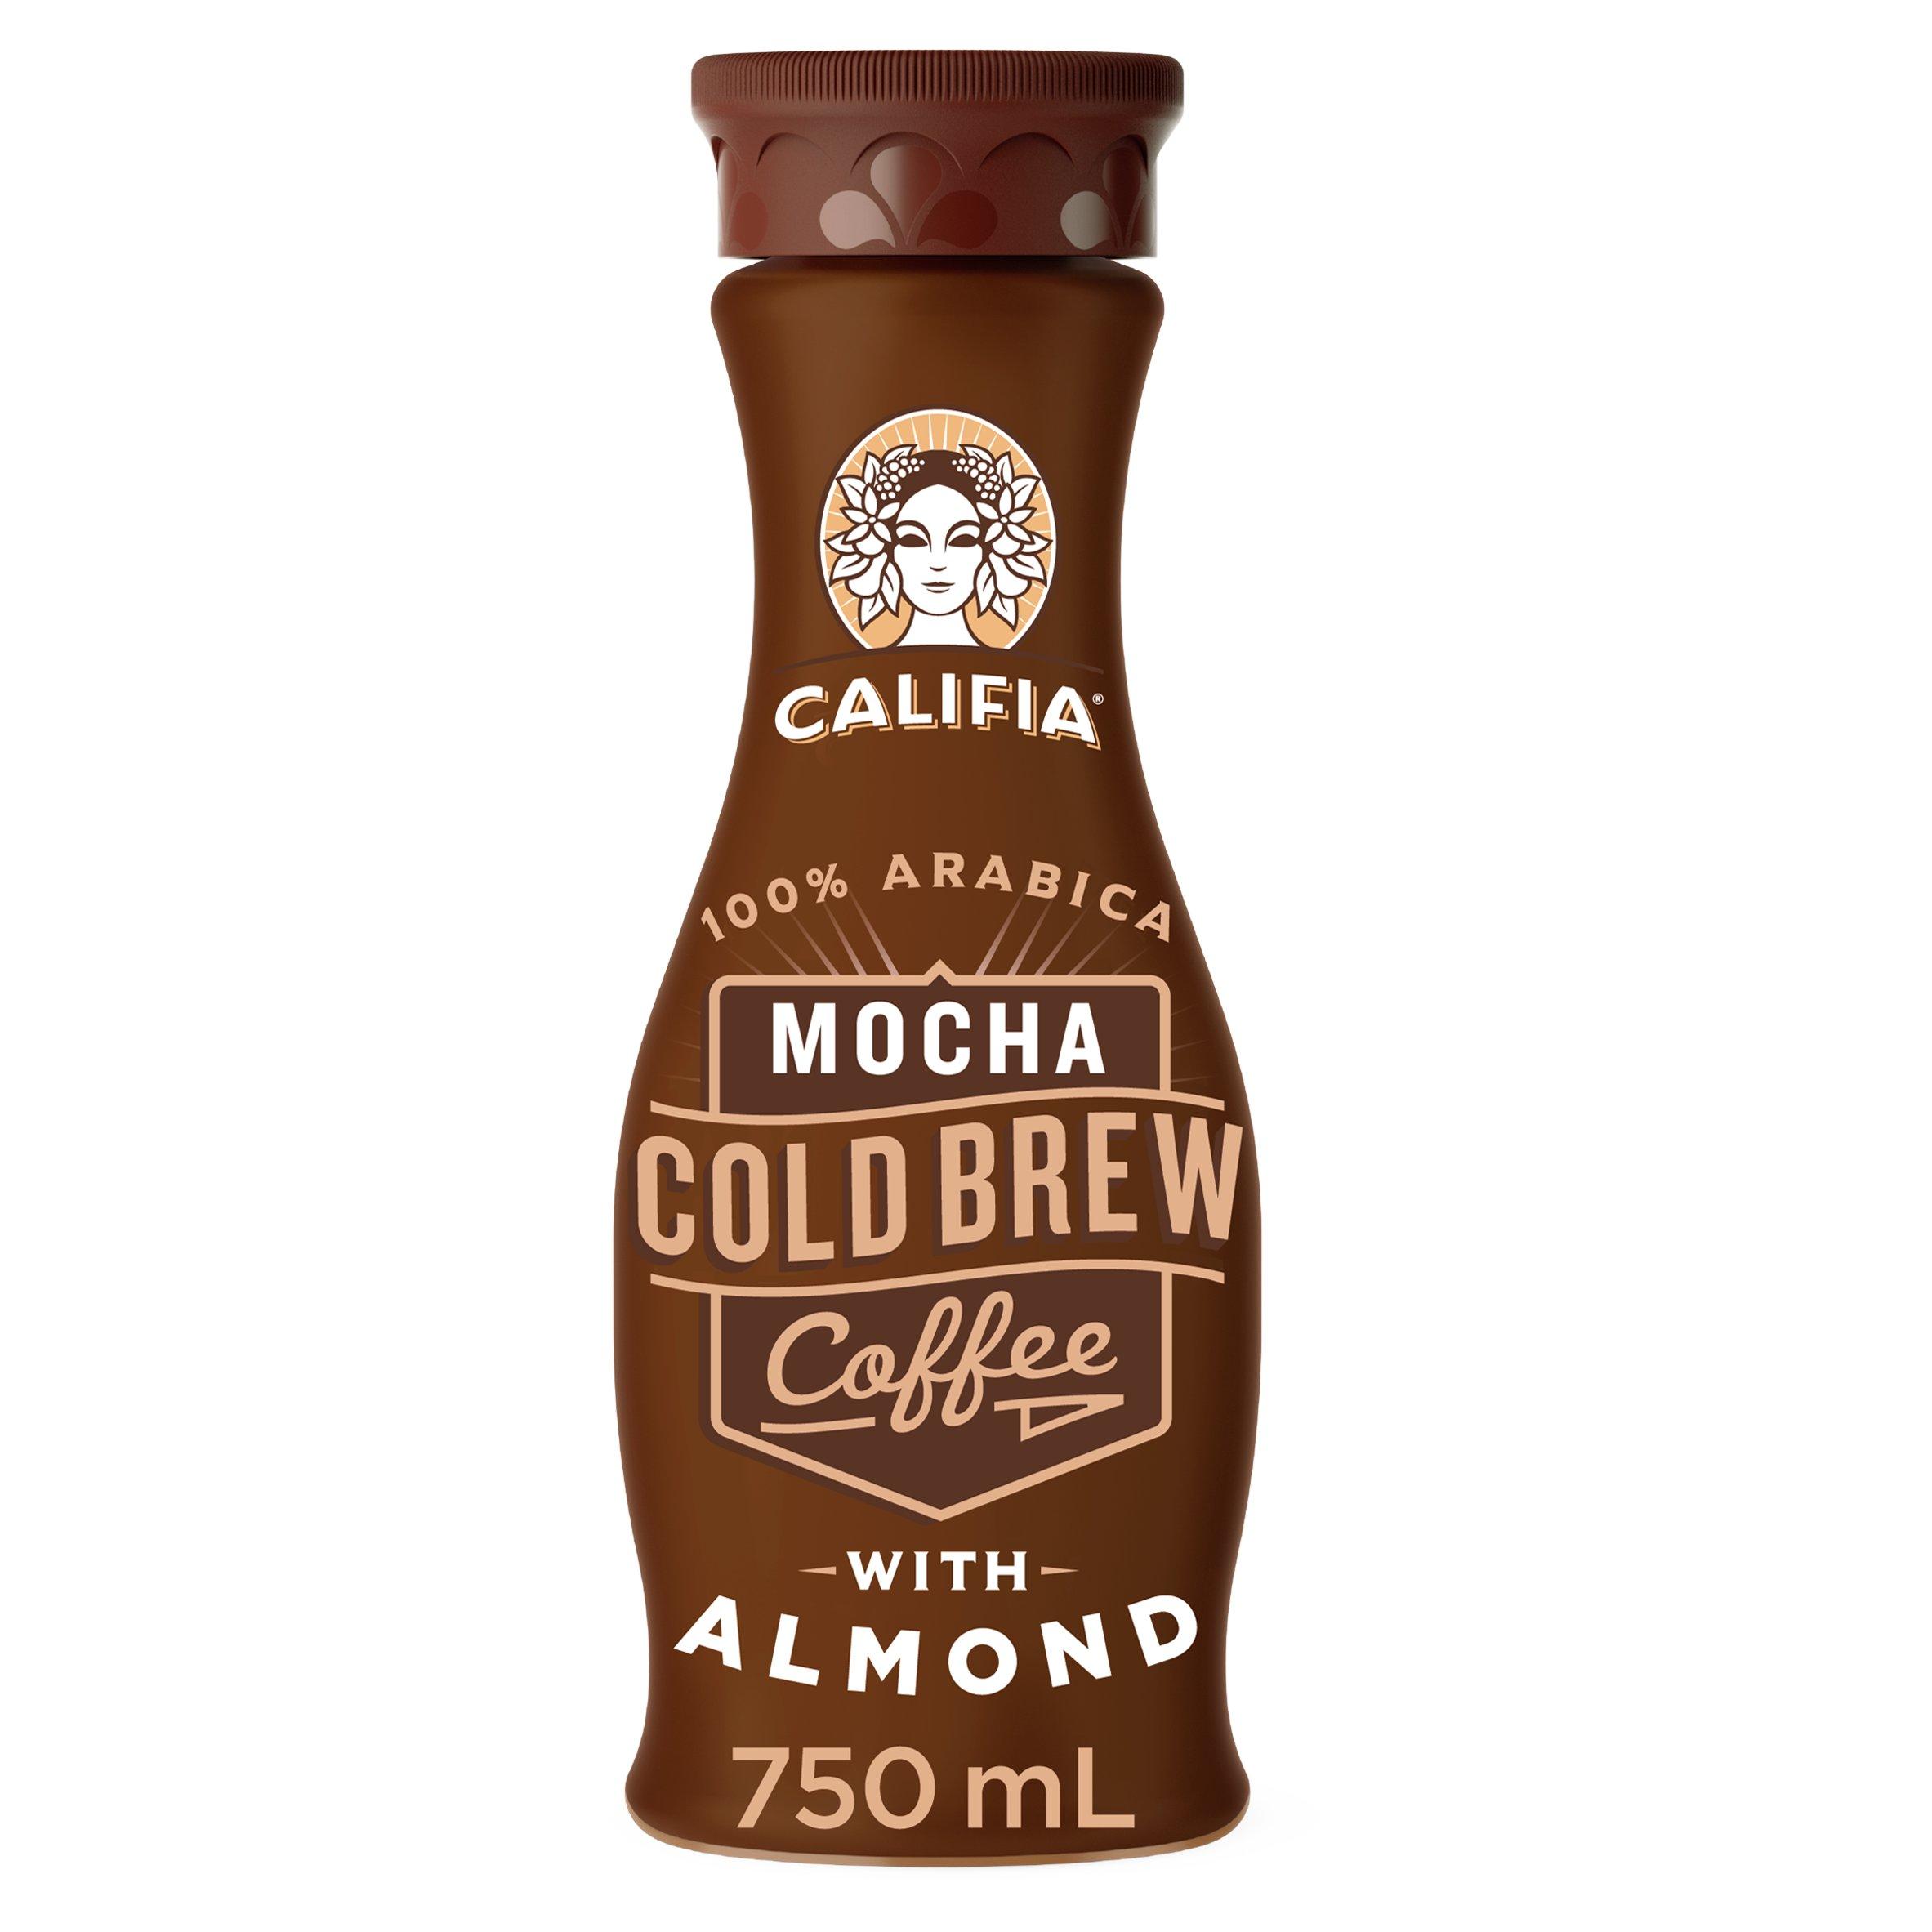 Califia Farms Mocha Cold Coffee With Almond 750Ml